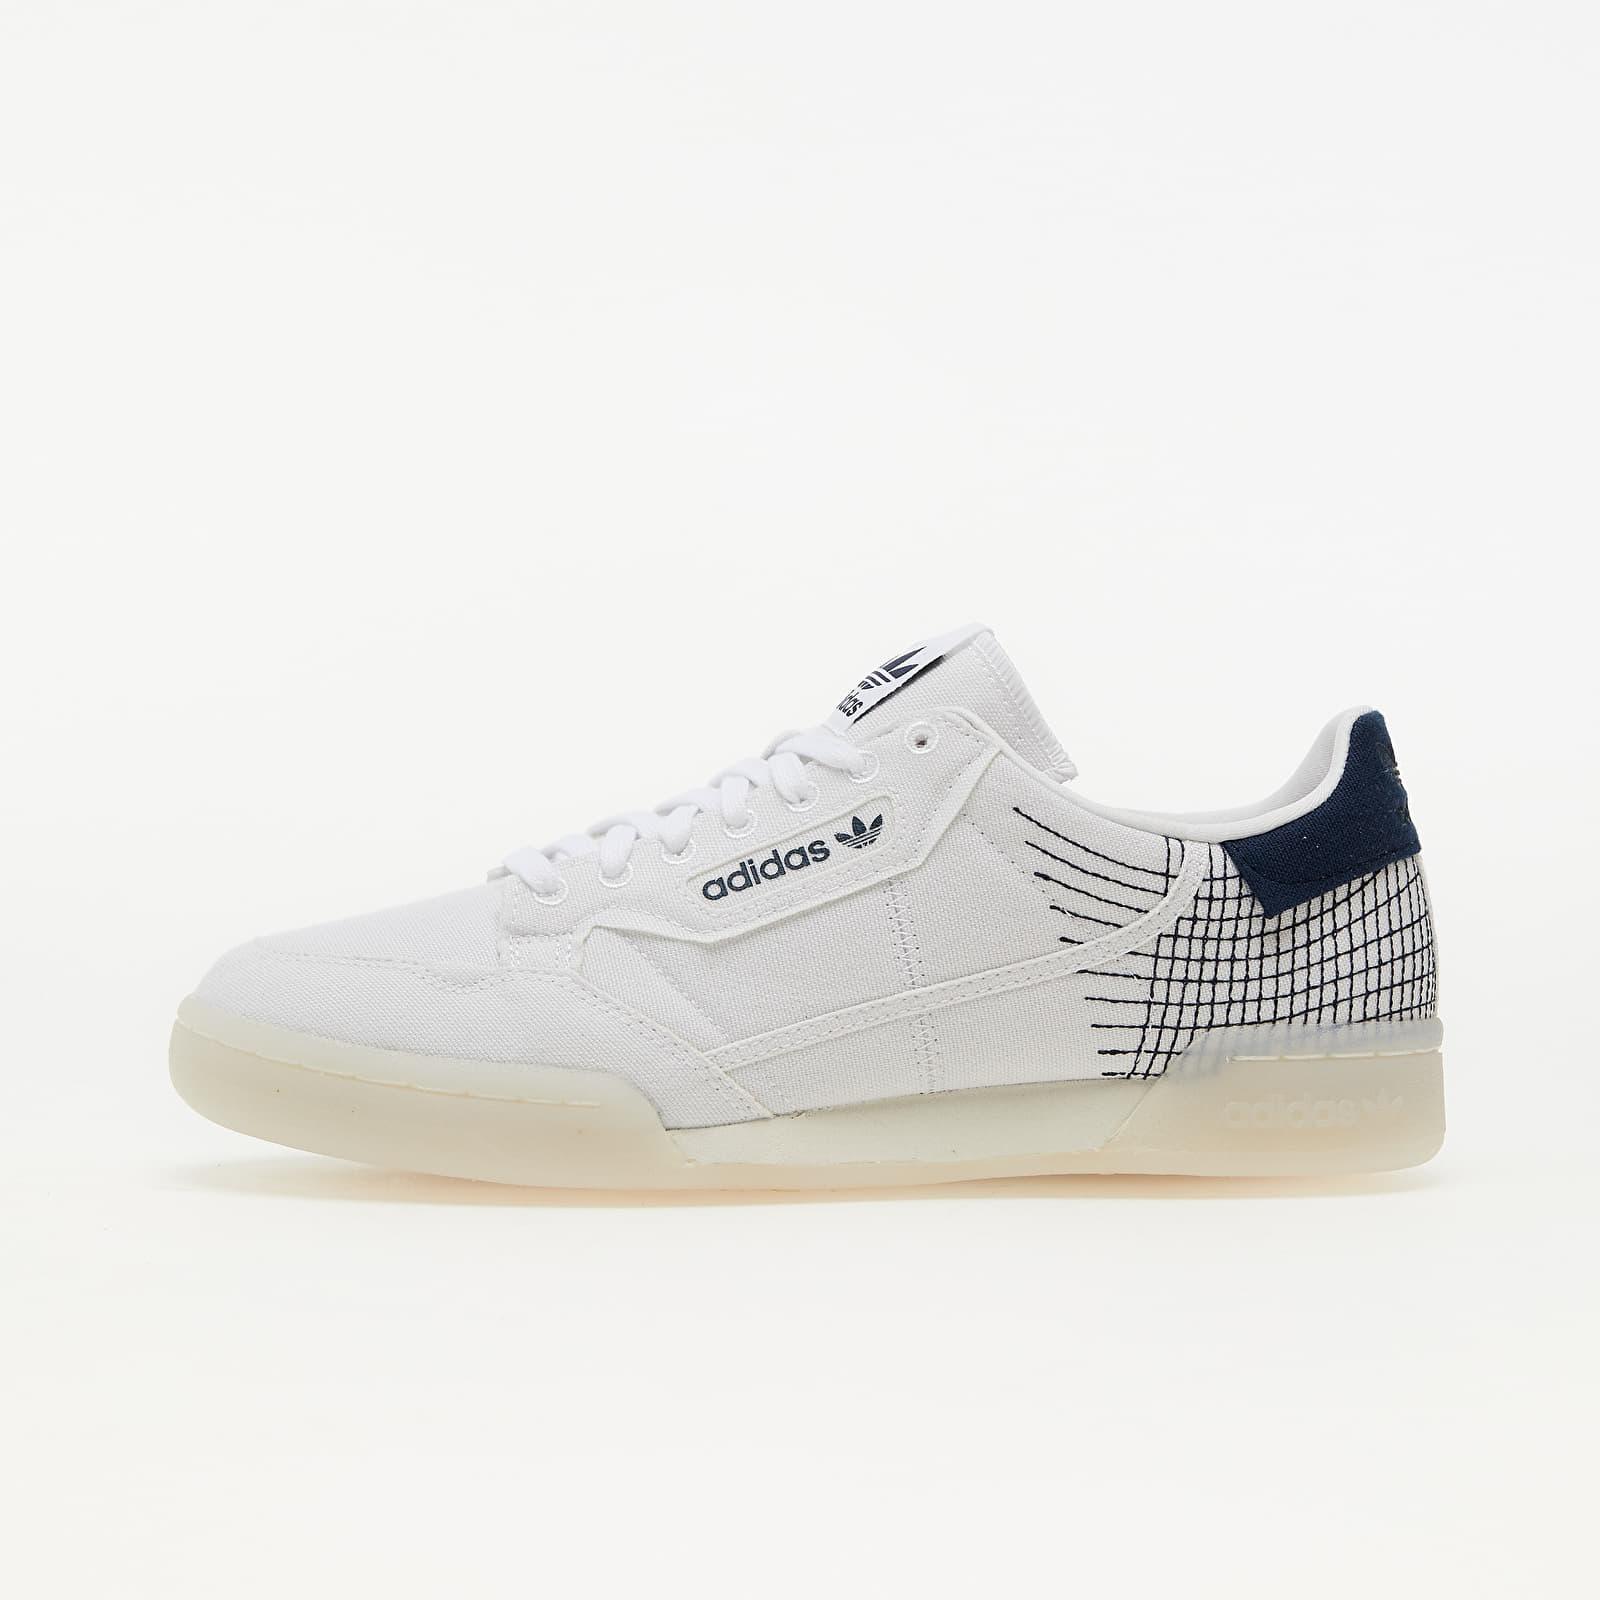 adidas Continental 80 Primeblue Core White/ Ftw White/ Collegiate Navy G58199